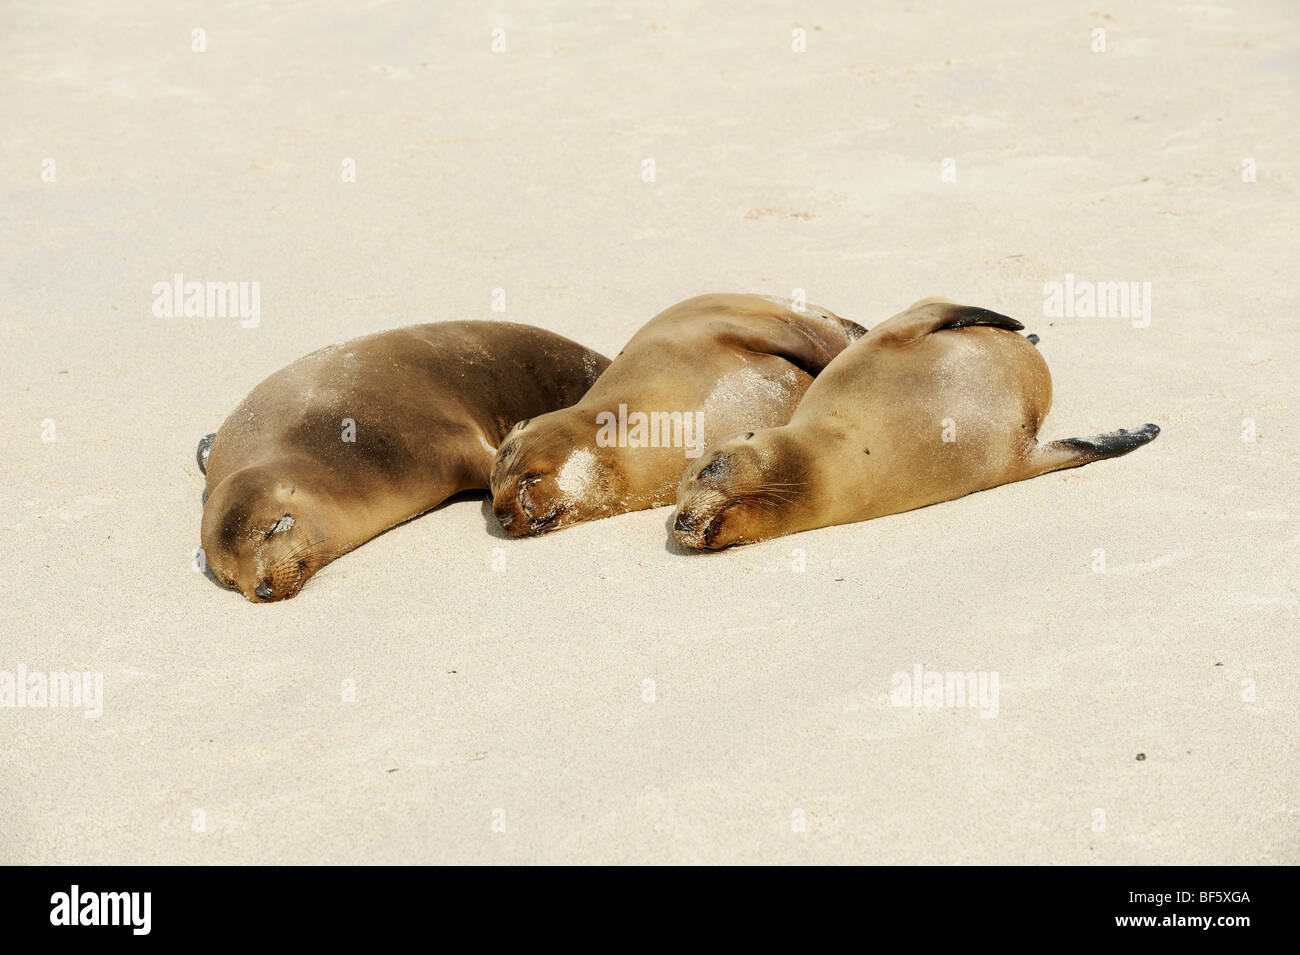 Galapagos-Seelöwe (Zalophus Wollebaeki), Erwachsene am Strand, Espanola Insel, Galapagos, Ecuador, Südamerika Stockbild